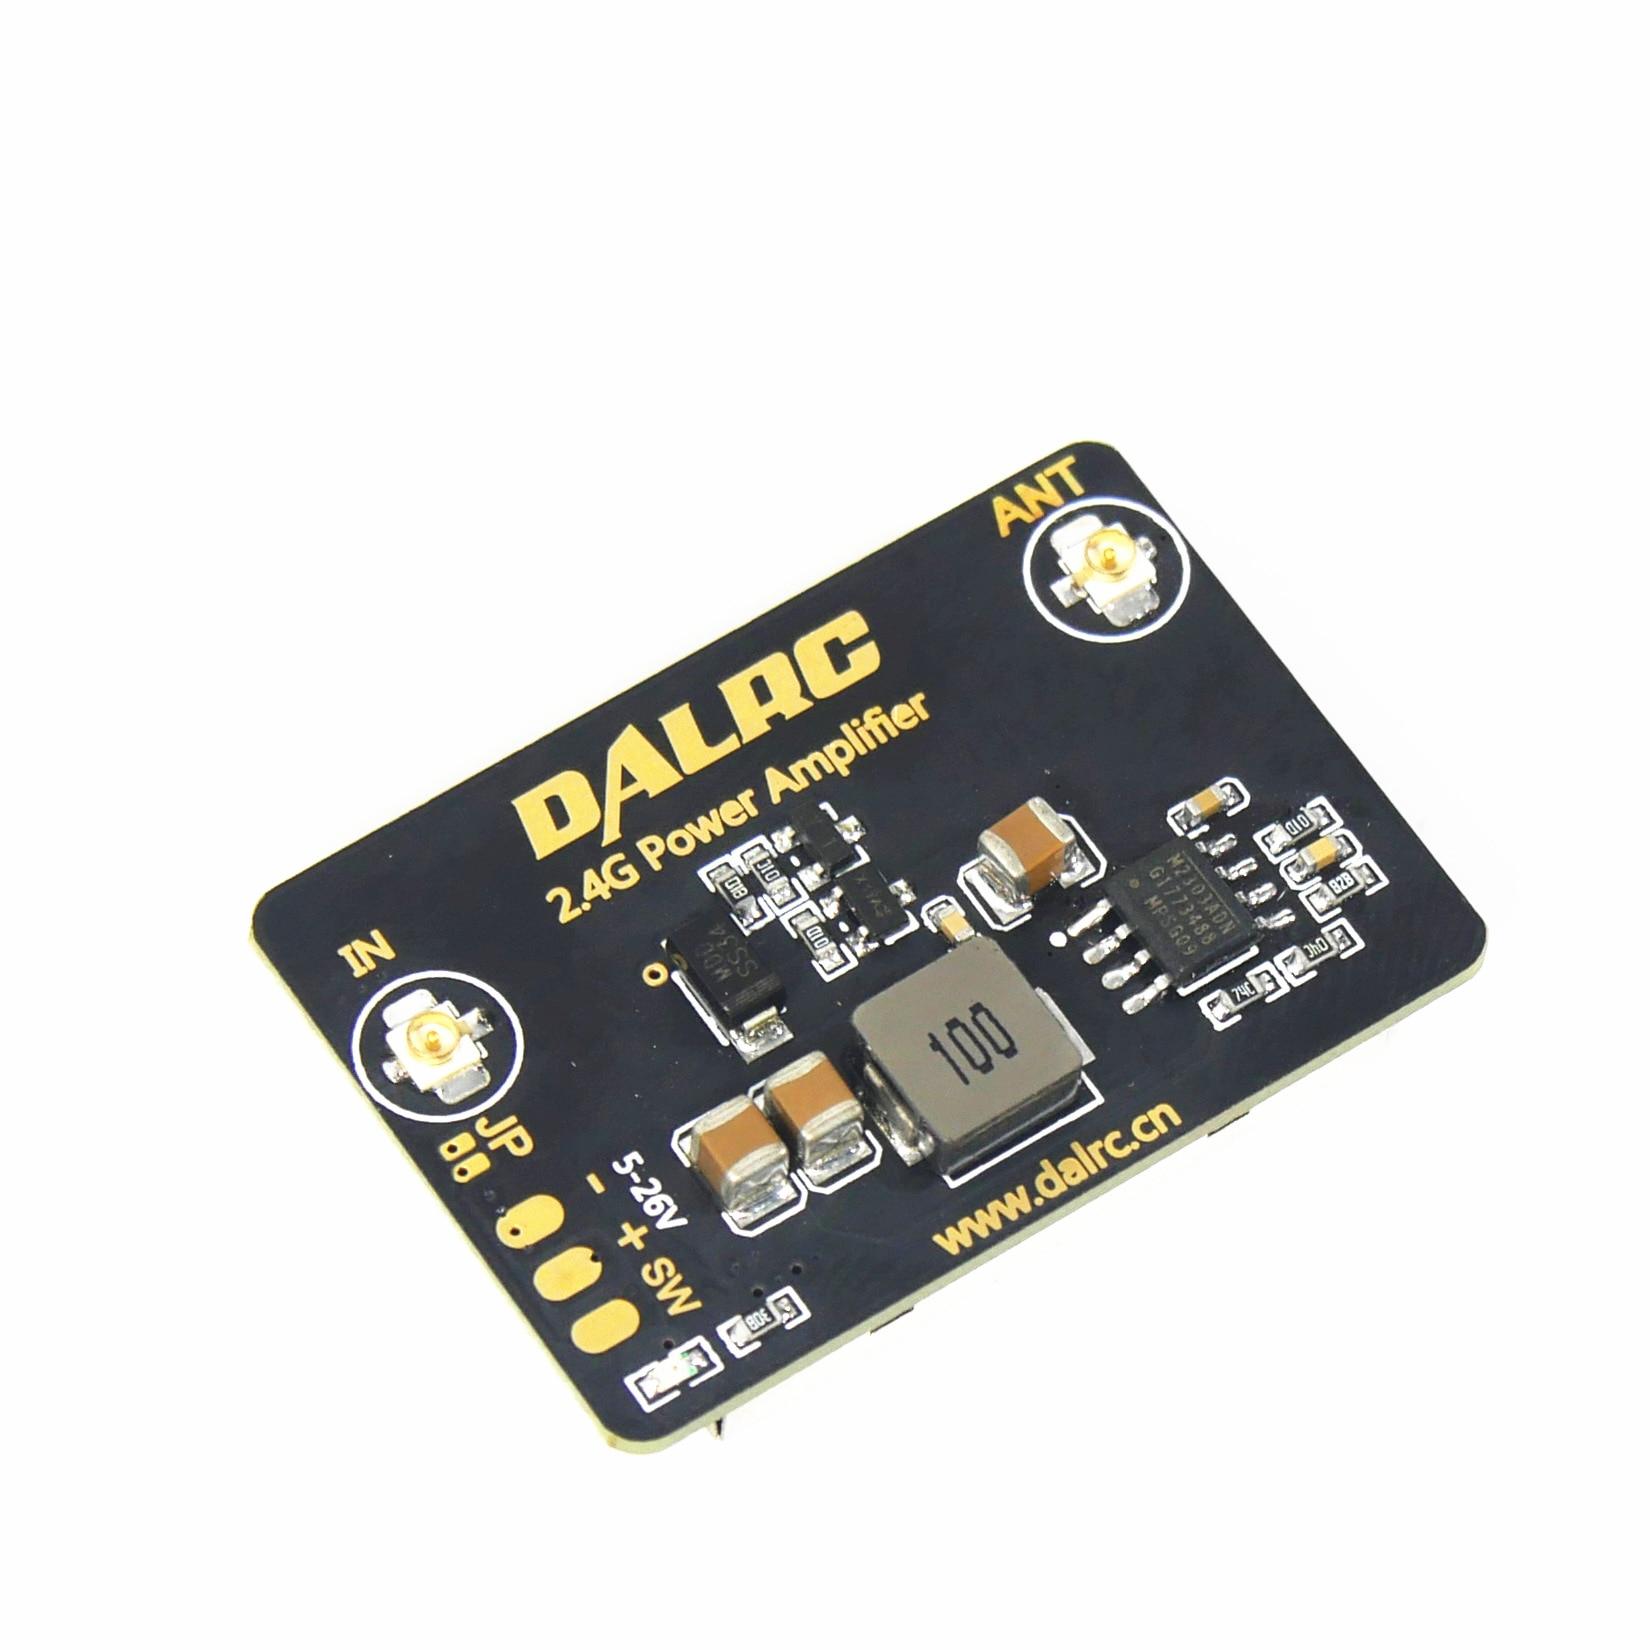 DALRC 2.4GHz 8dBm remote controller transmission power Amplifier distance extend